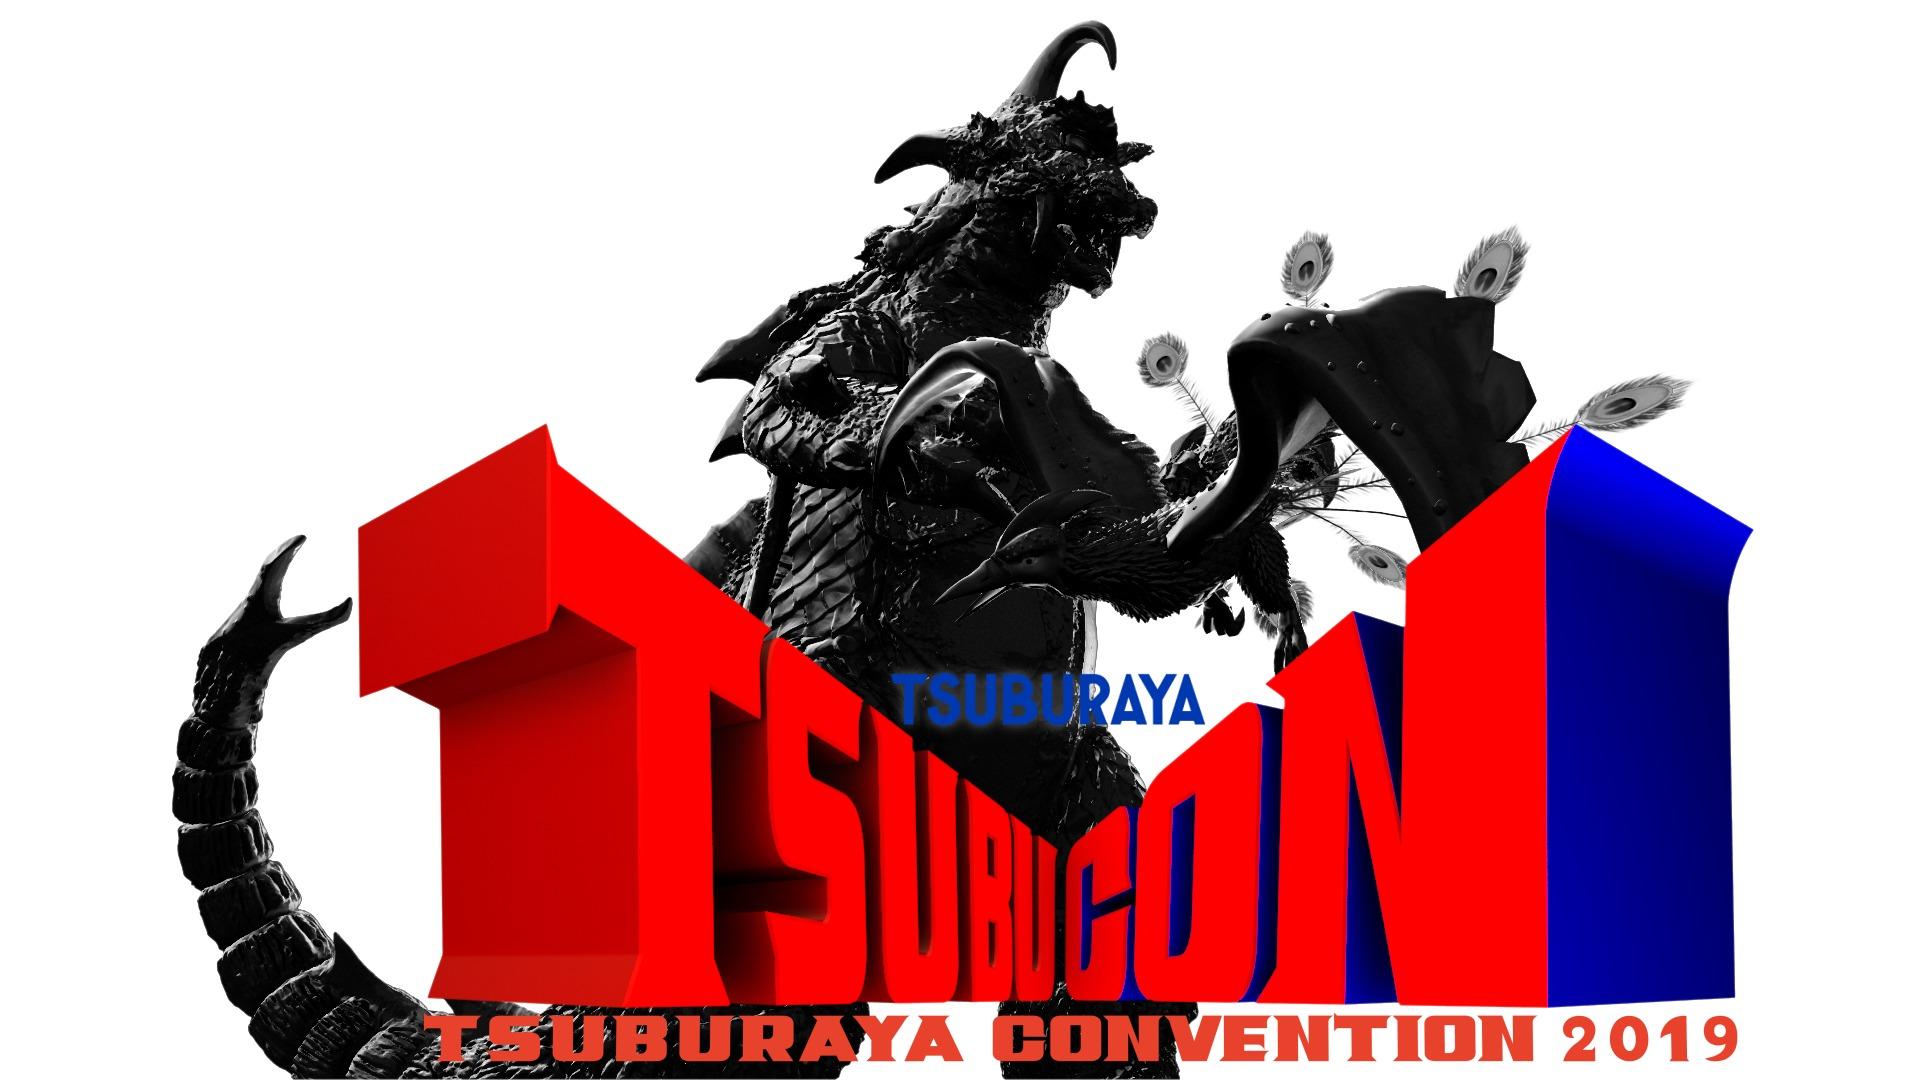 『TSUBURAYA CONVENTION 2019』ロゴ (C)円谷プロ (C)Eiichi Shimizu,Tomohiro Shimoguchi (C)ULTRAMAN製作委員会